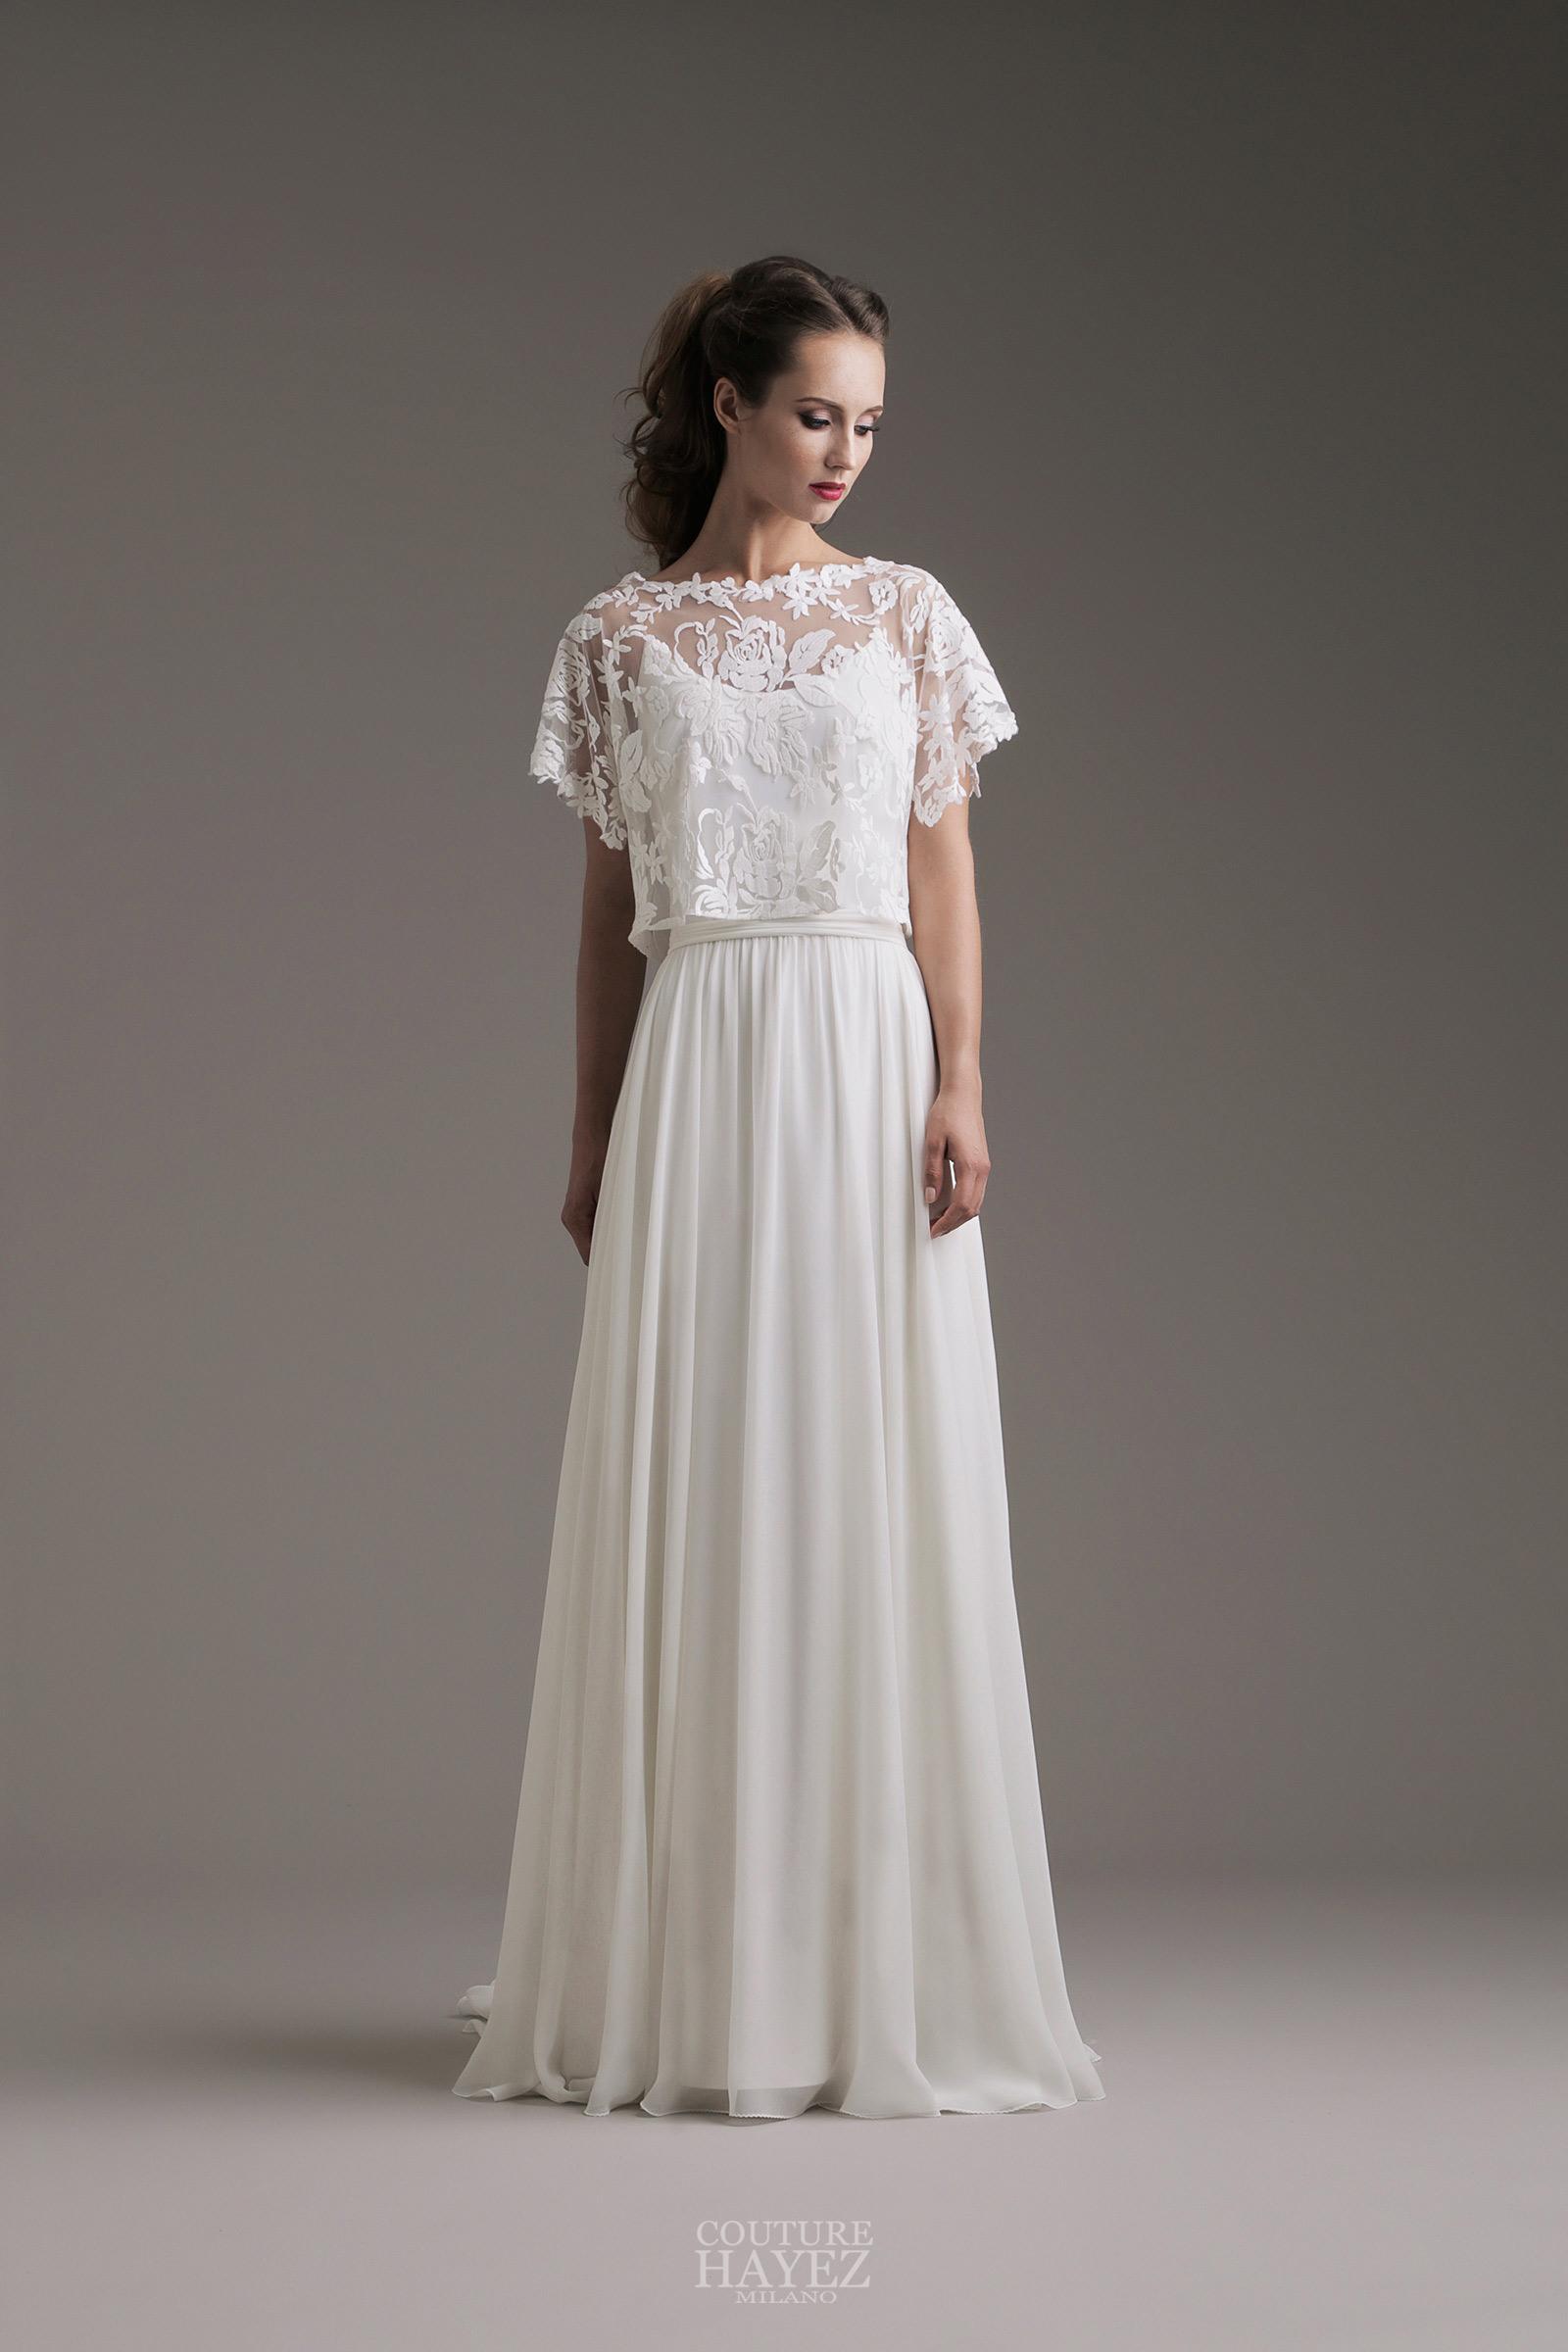 Conosciuto Lisa: abito con crop top in tulle ricamato - Couture Hayez Milano XH21